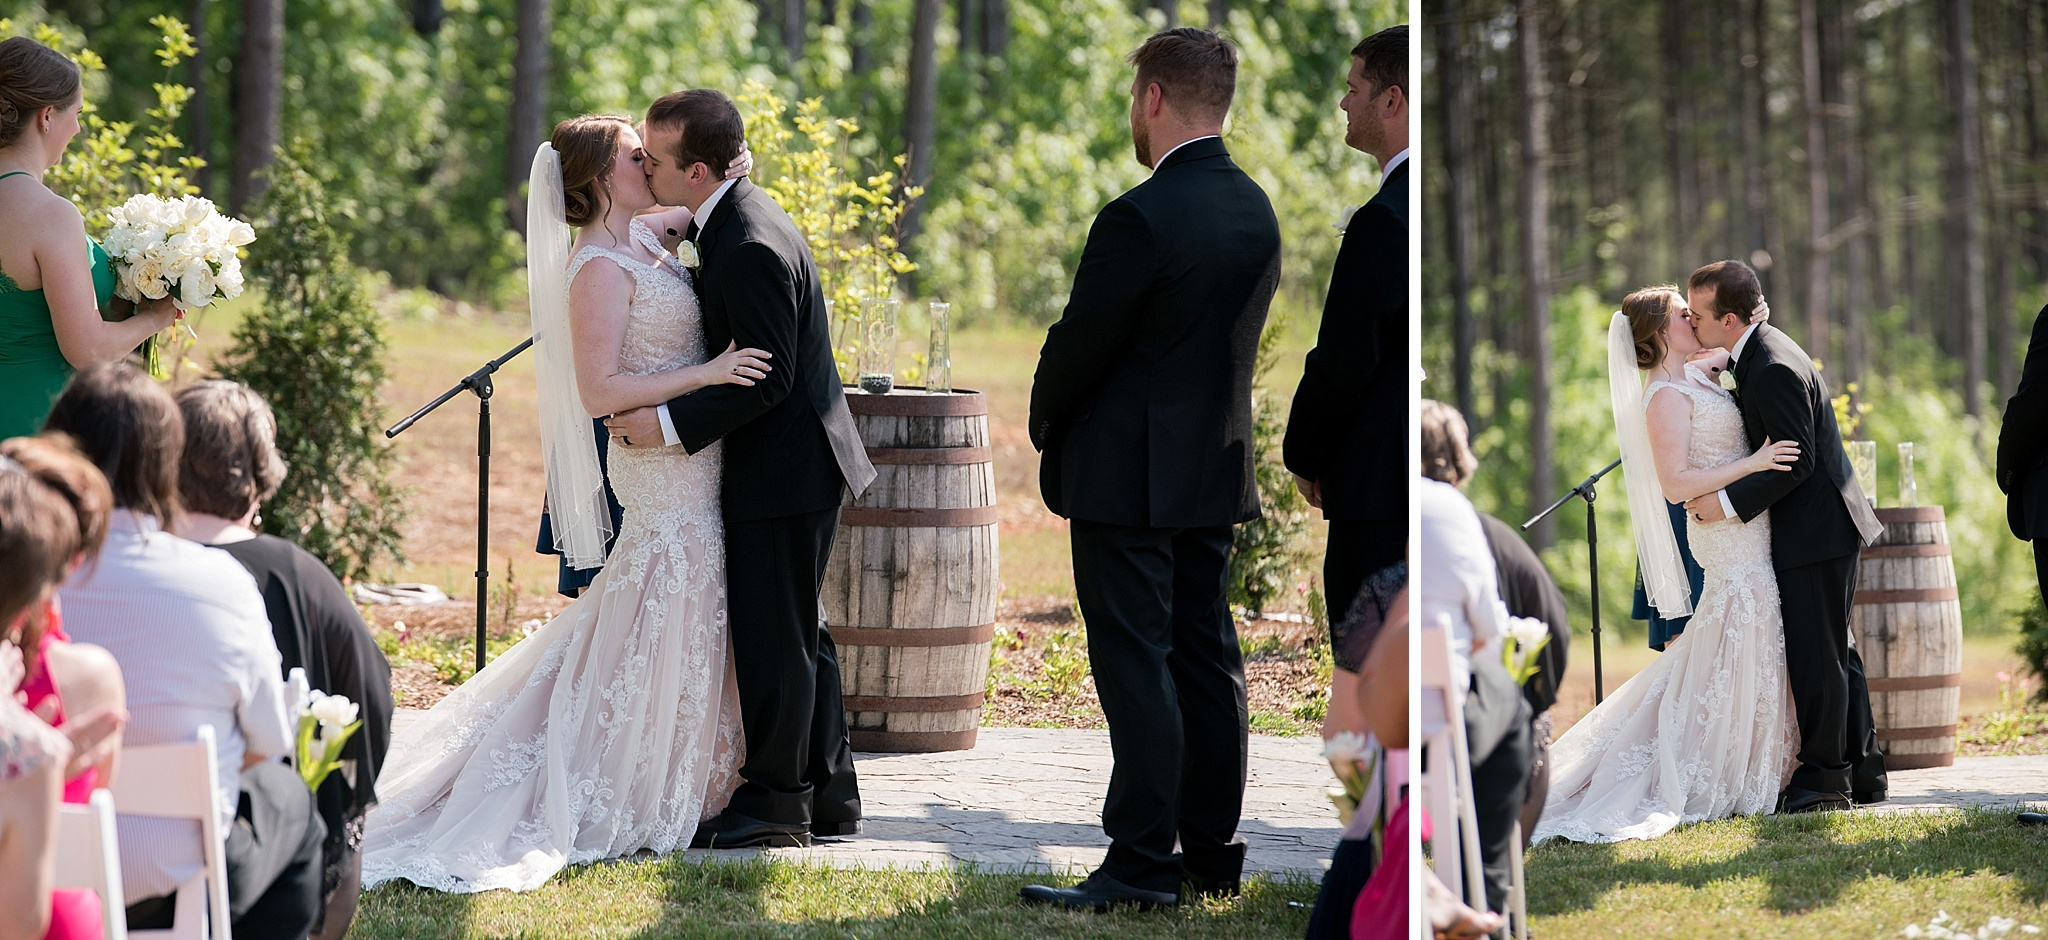 Pavilion-Carriage-Farms-Wedding-Photographer-192.jpg